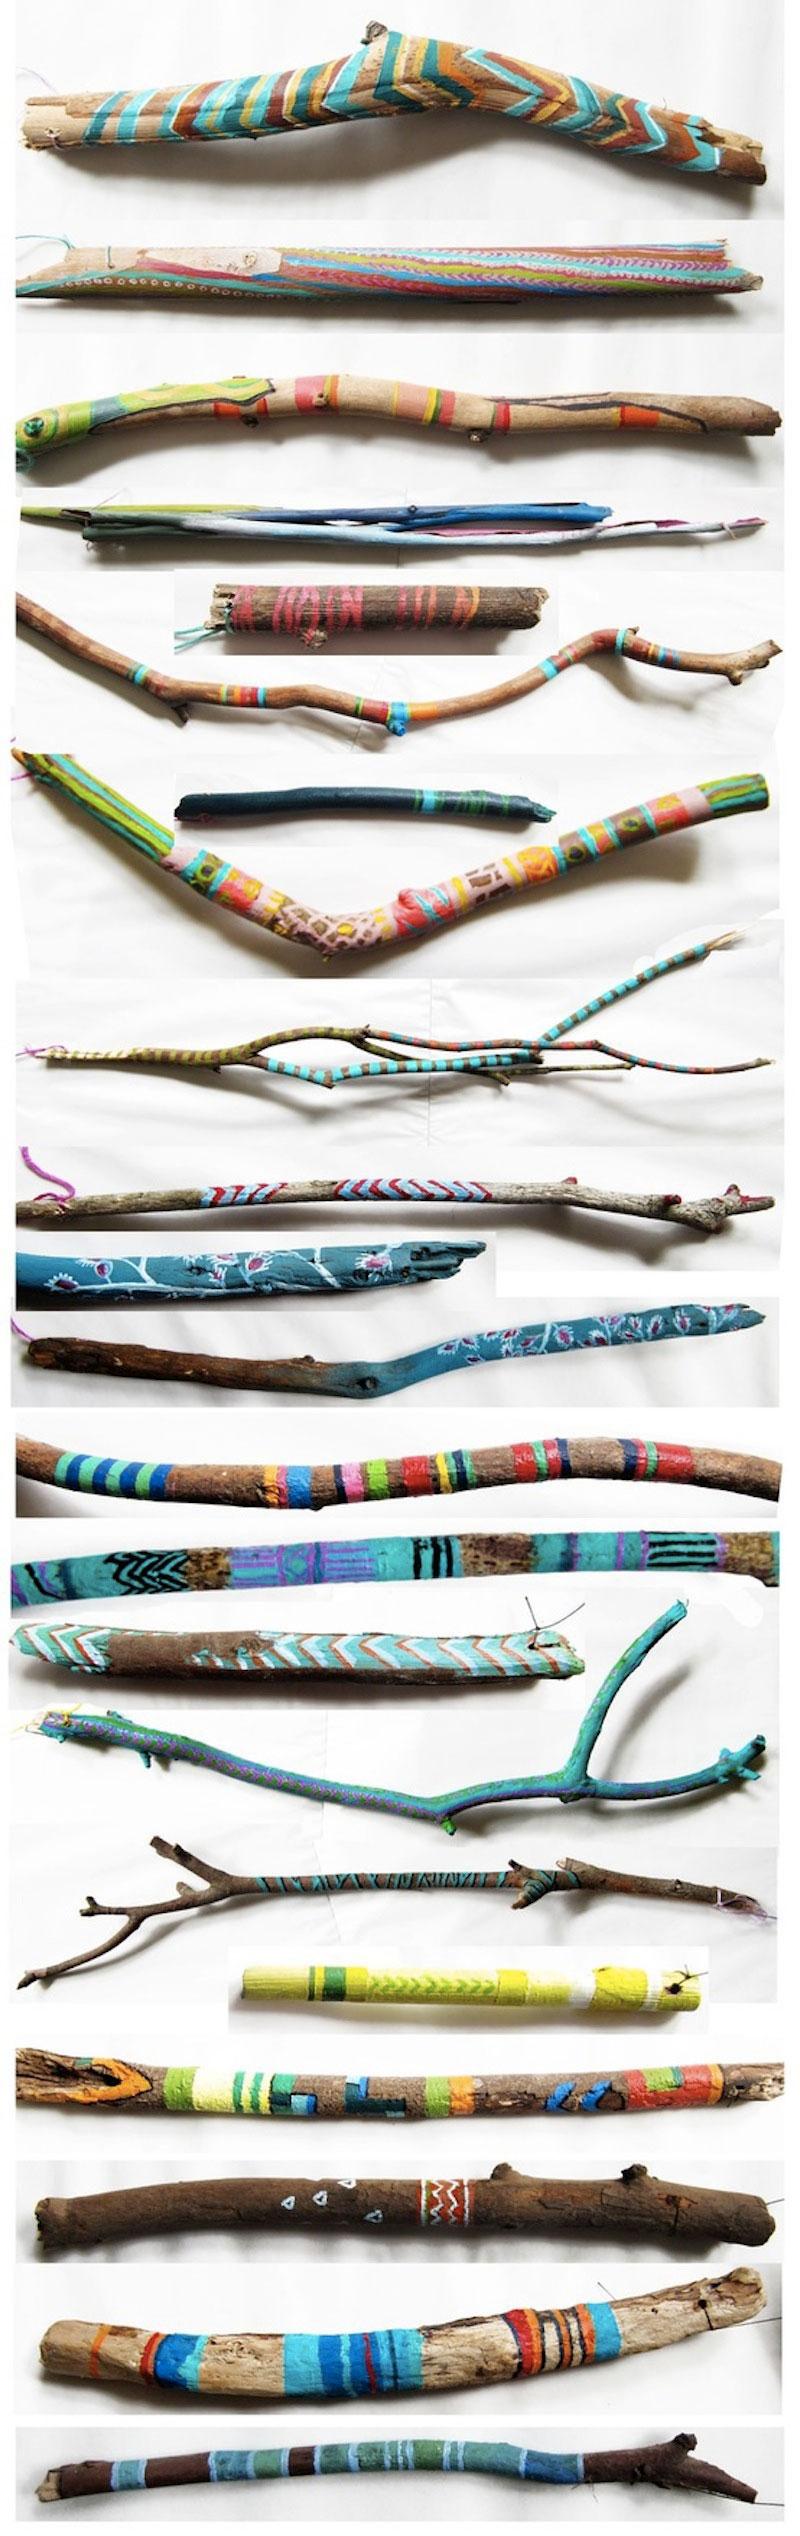 Refried-hippie-DIY-painted-sticks